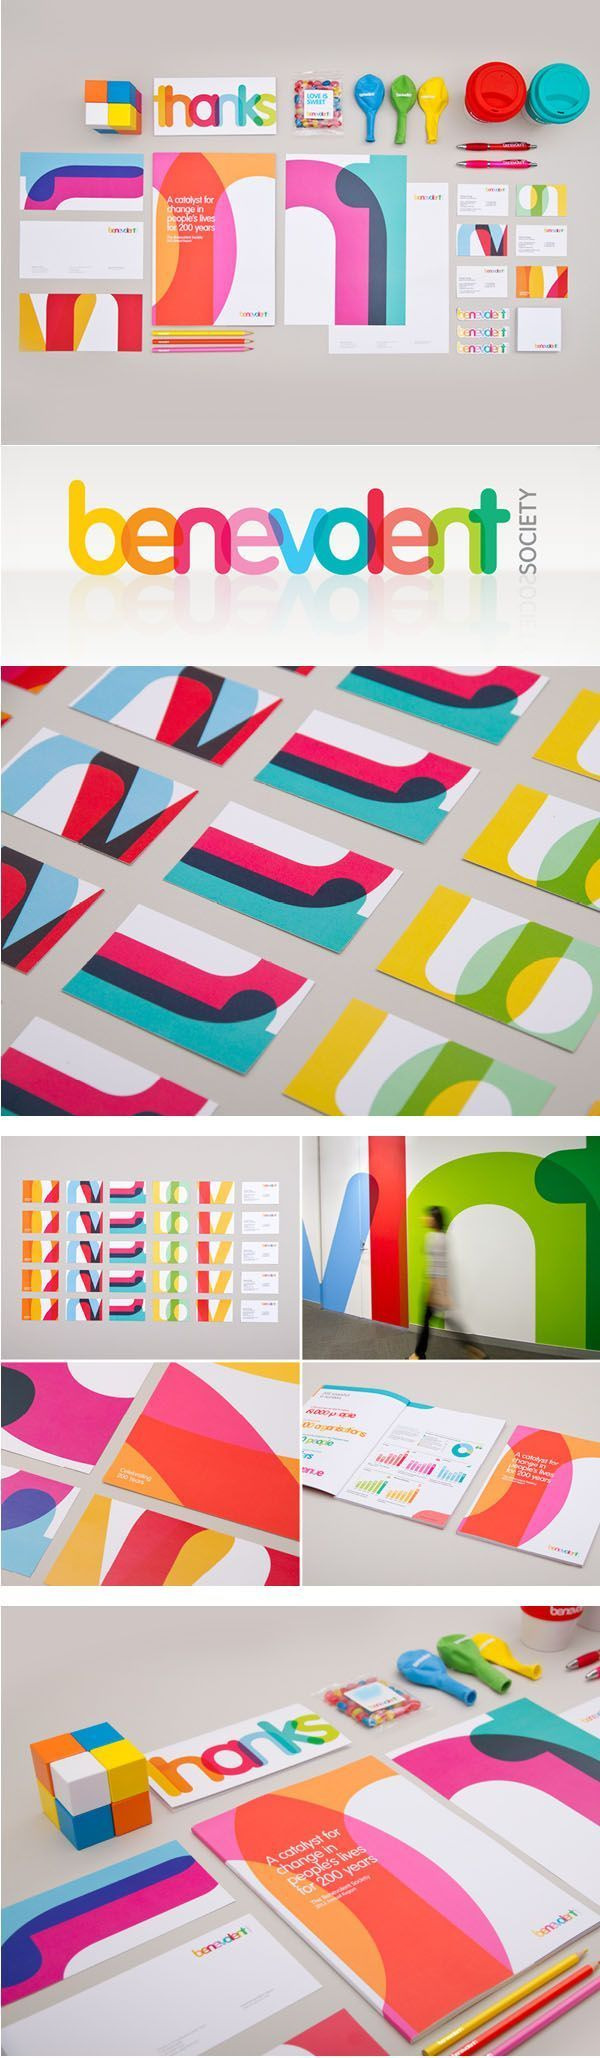 30 Brilliant Branding Identity Design examples for your inspiration. Follow us www.pinterest.com/webneel